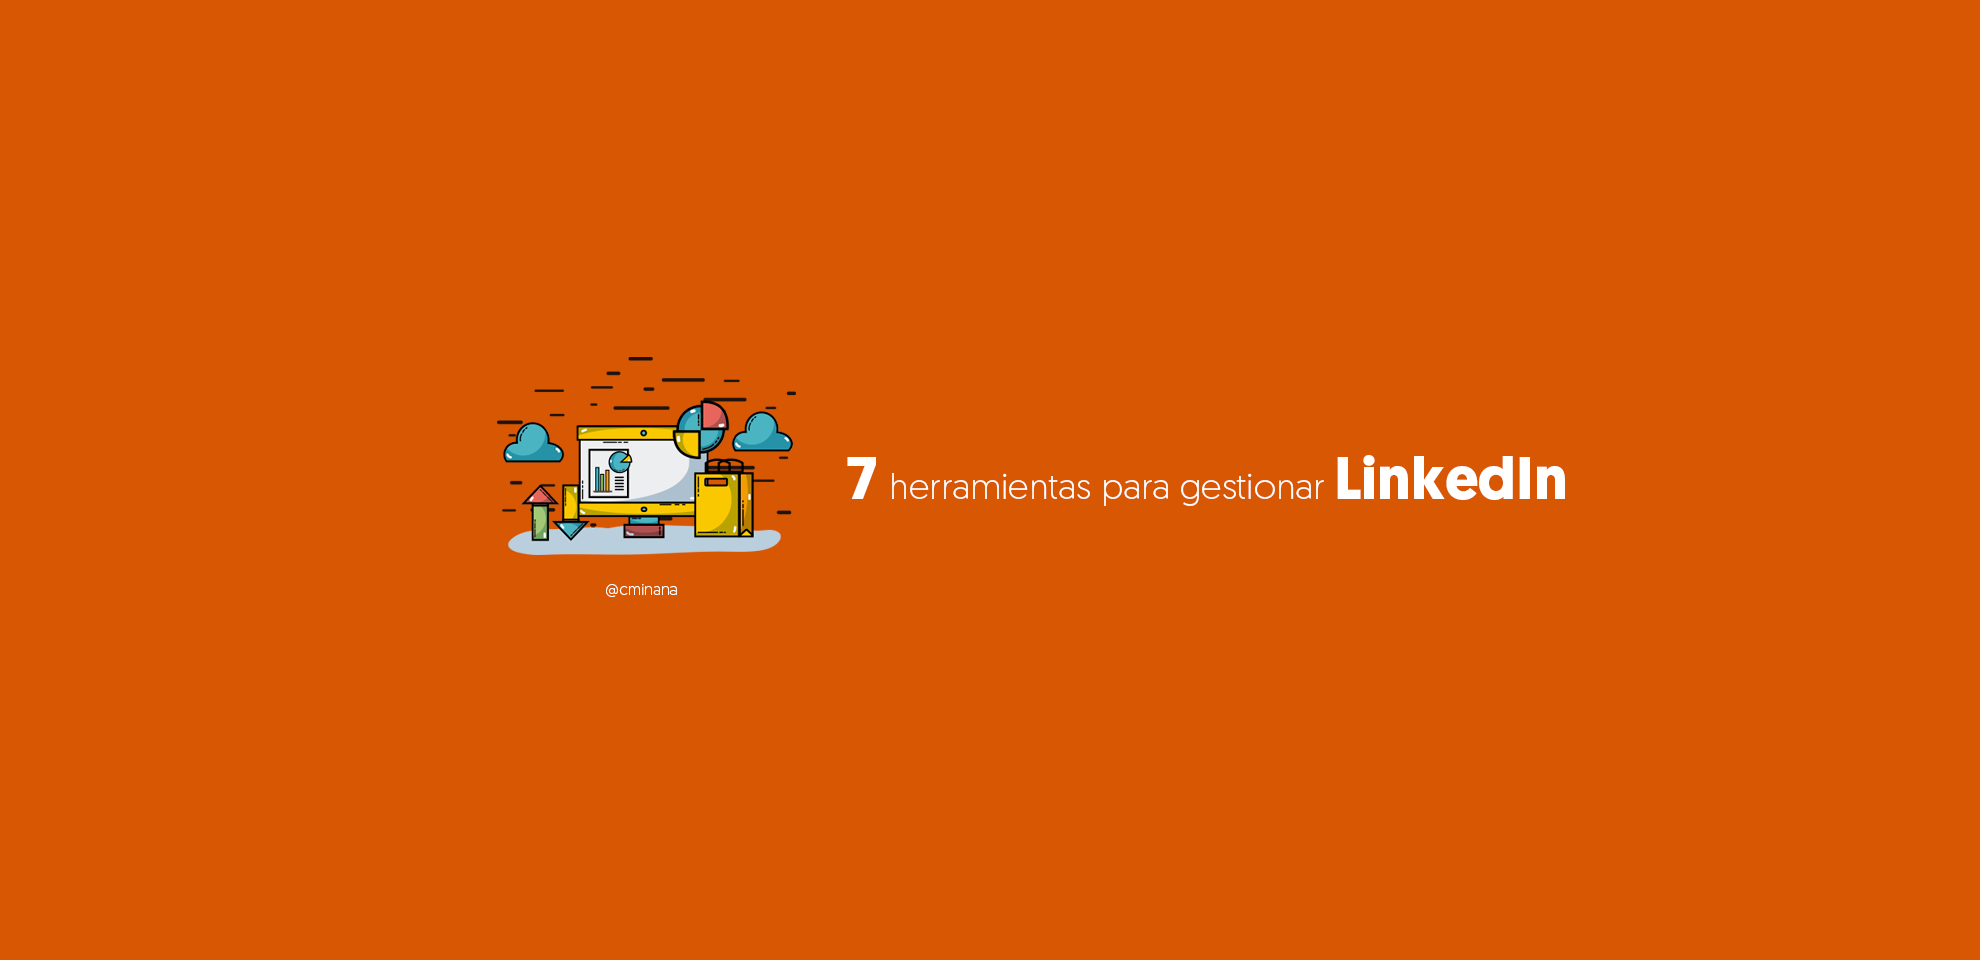 herramientas LinkedIn